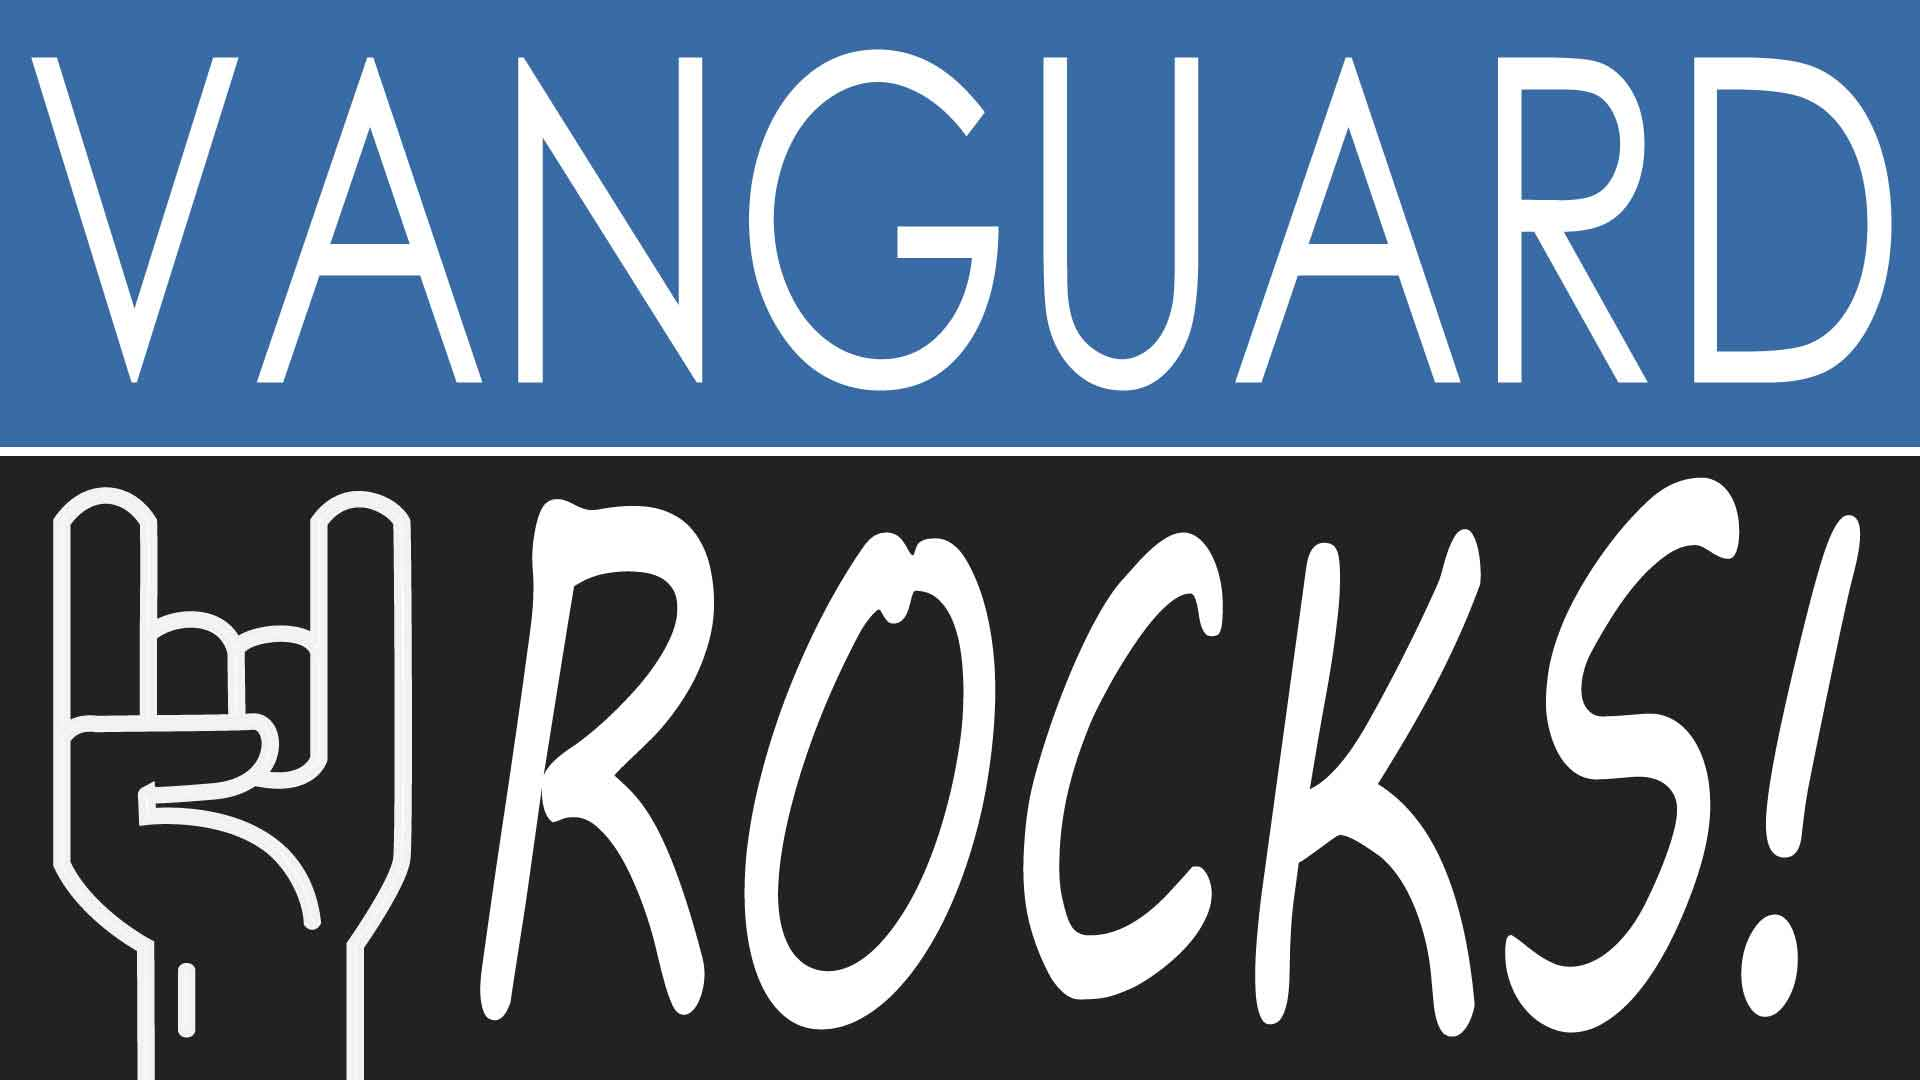 Vanguard Rocks: Rocking Out!